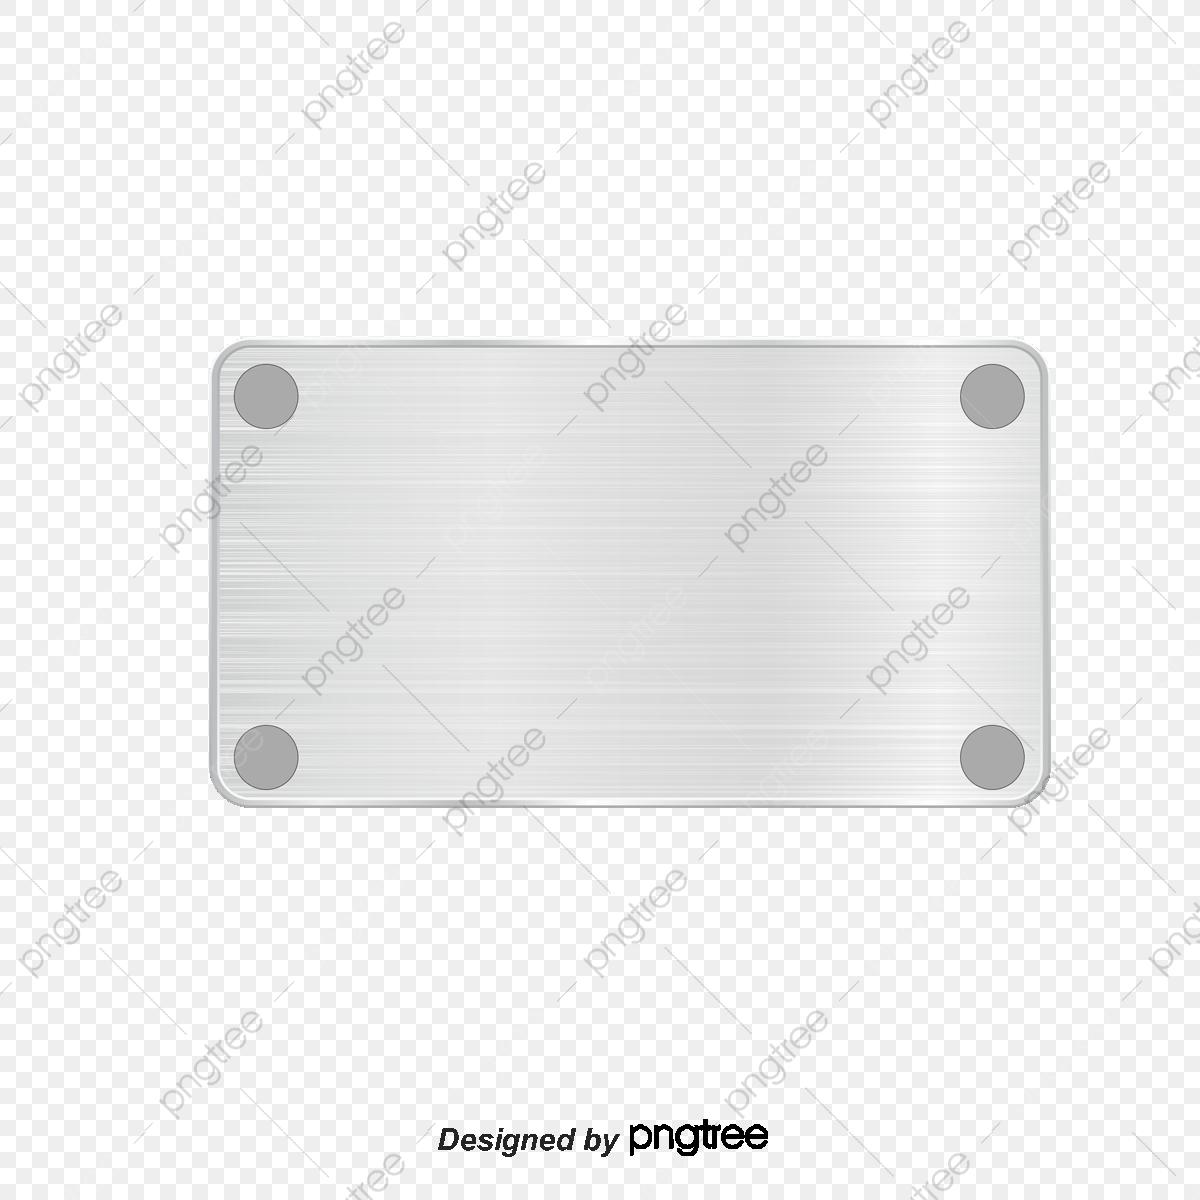 Placa De Metal Do Rebite, Vector De Material, Textura De.